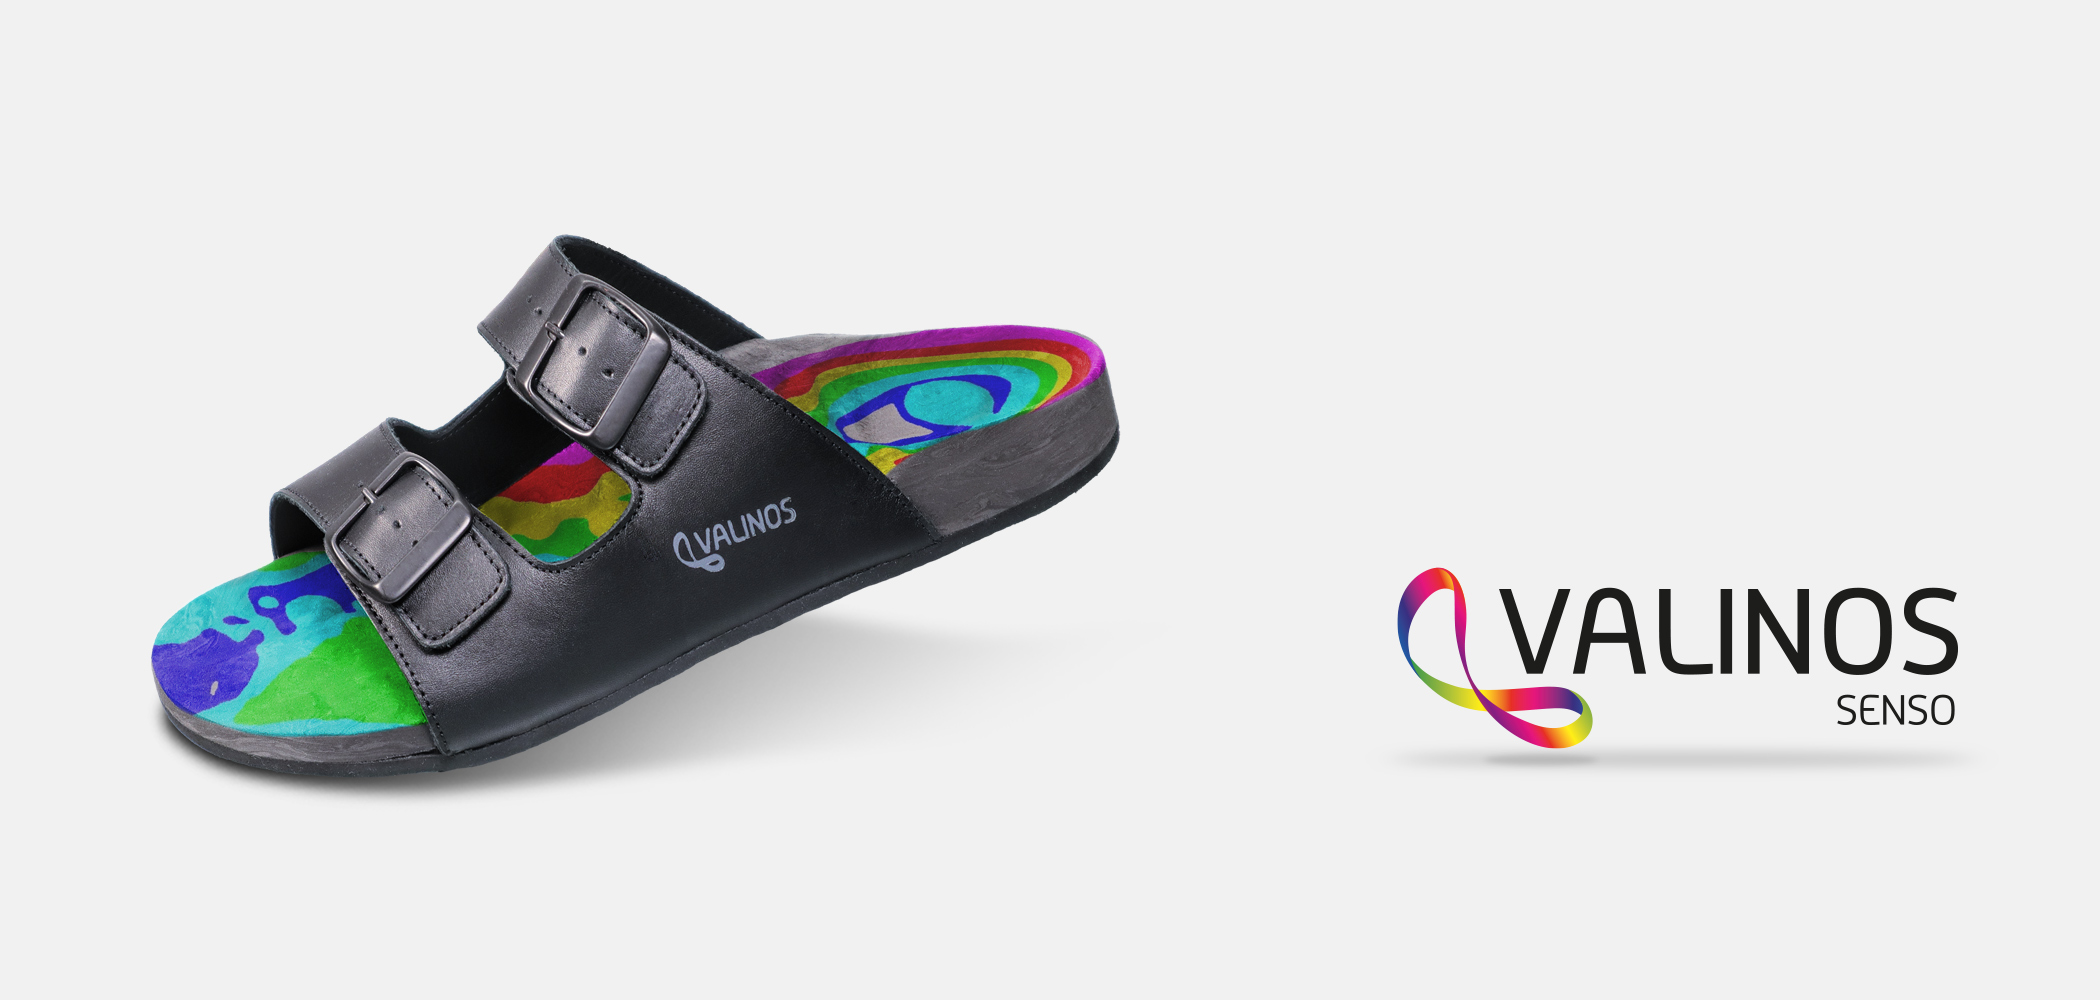 VALINOS Senso Fußreflexzonen-Stimulation